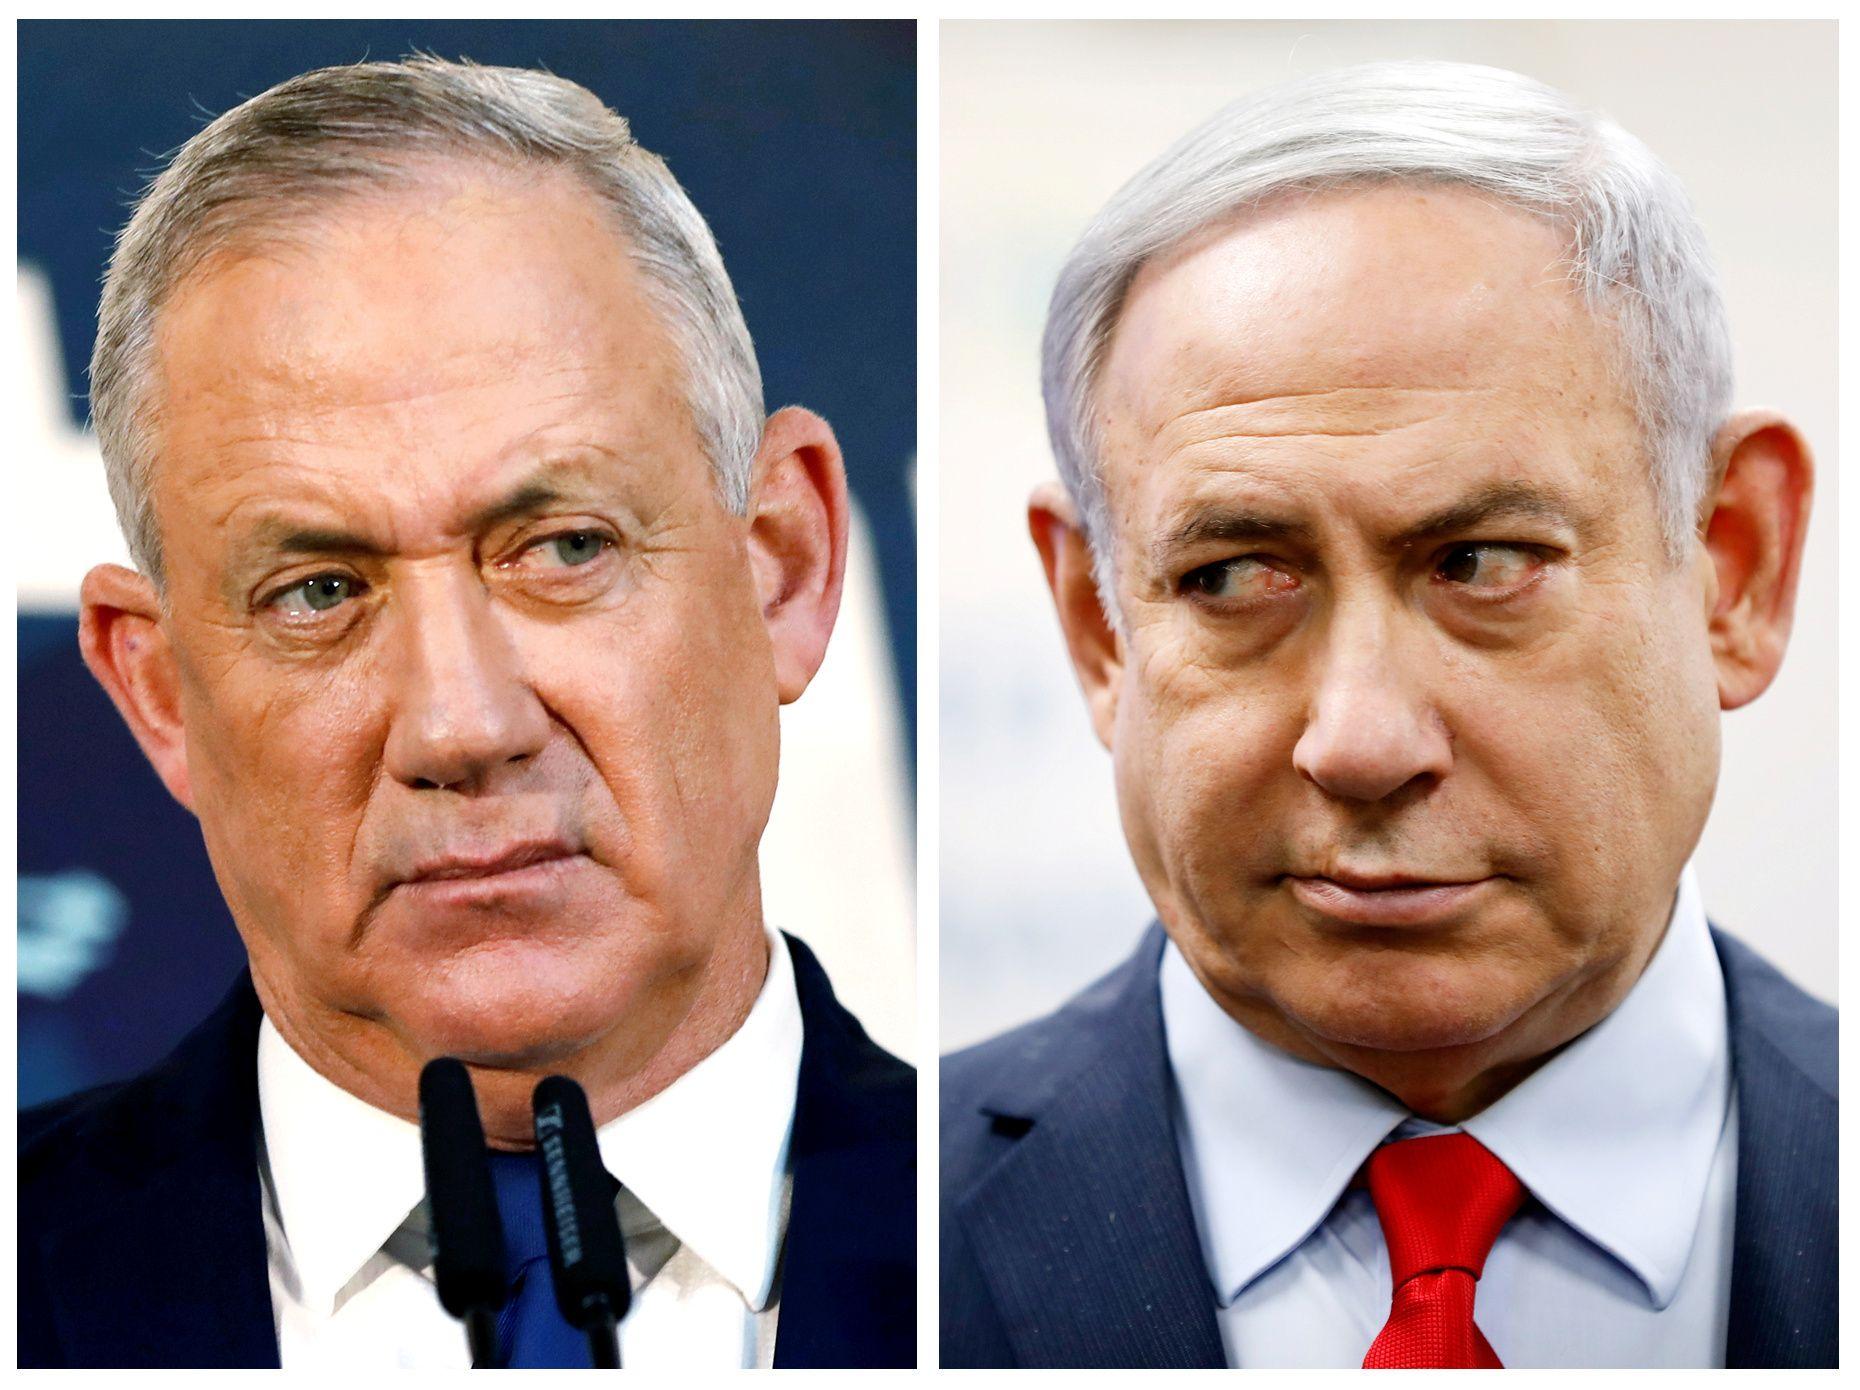 Non-coronavirus news: Israel's deadlock, Sanders' future, and Putin's forever plan